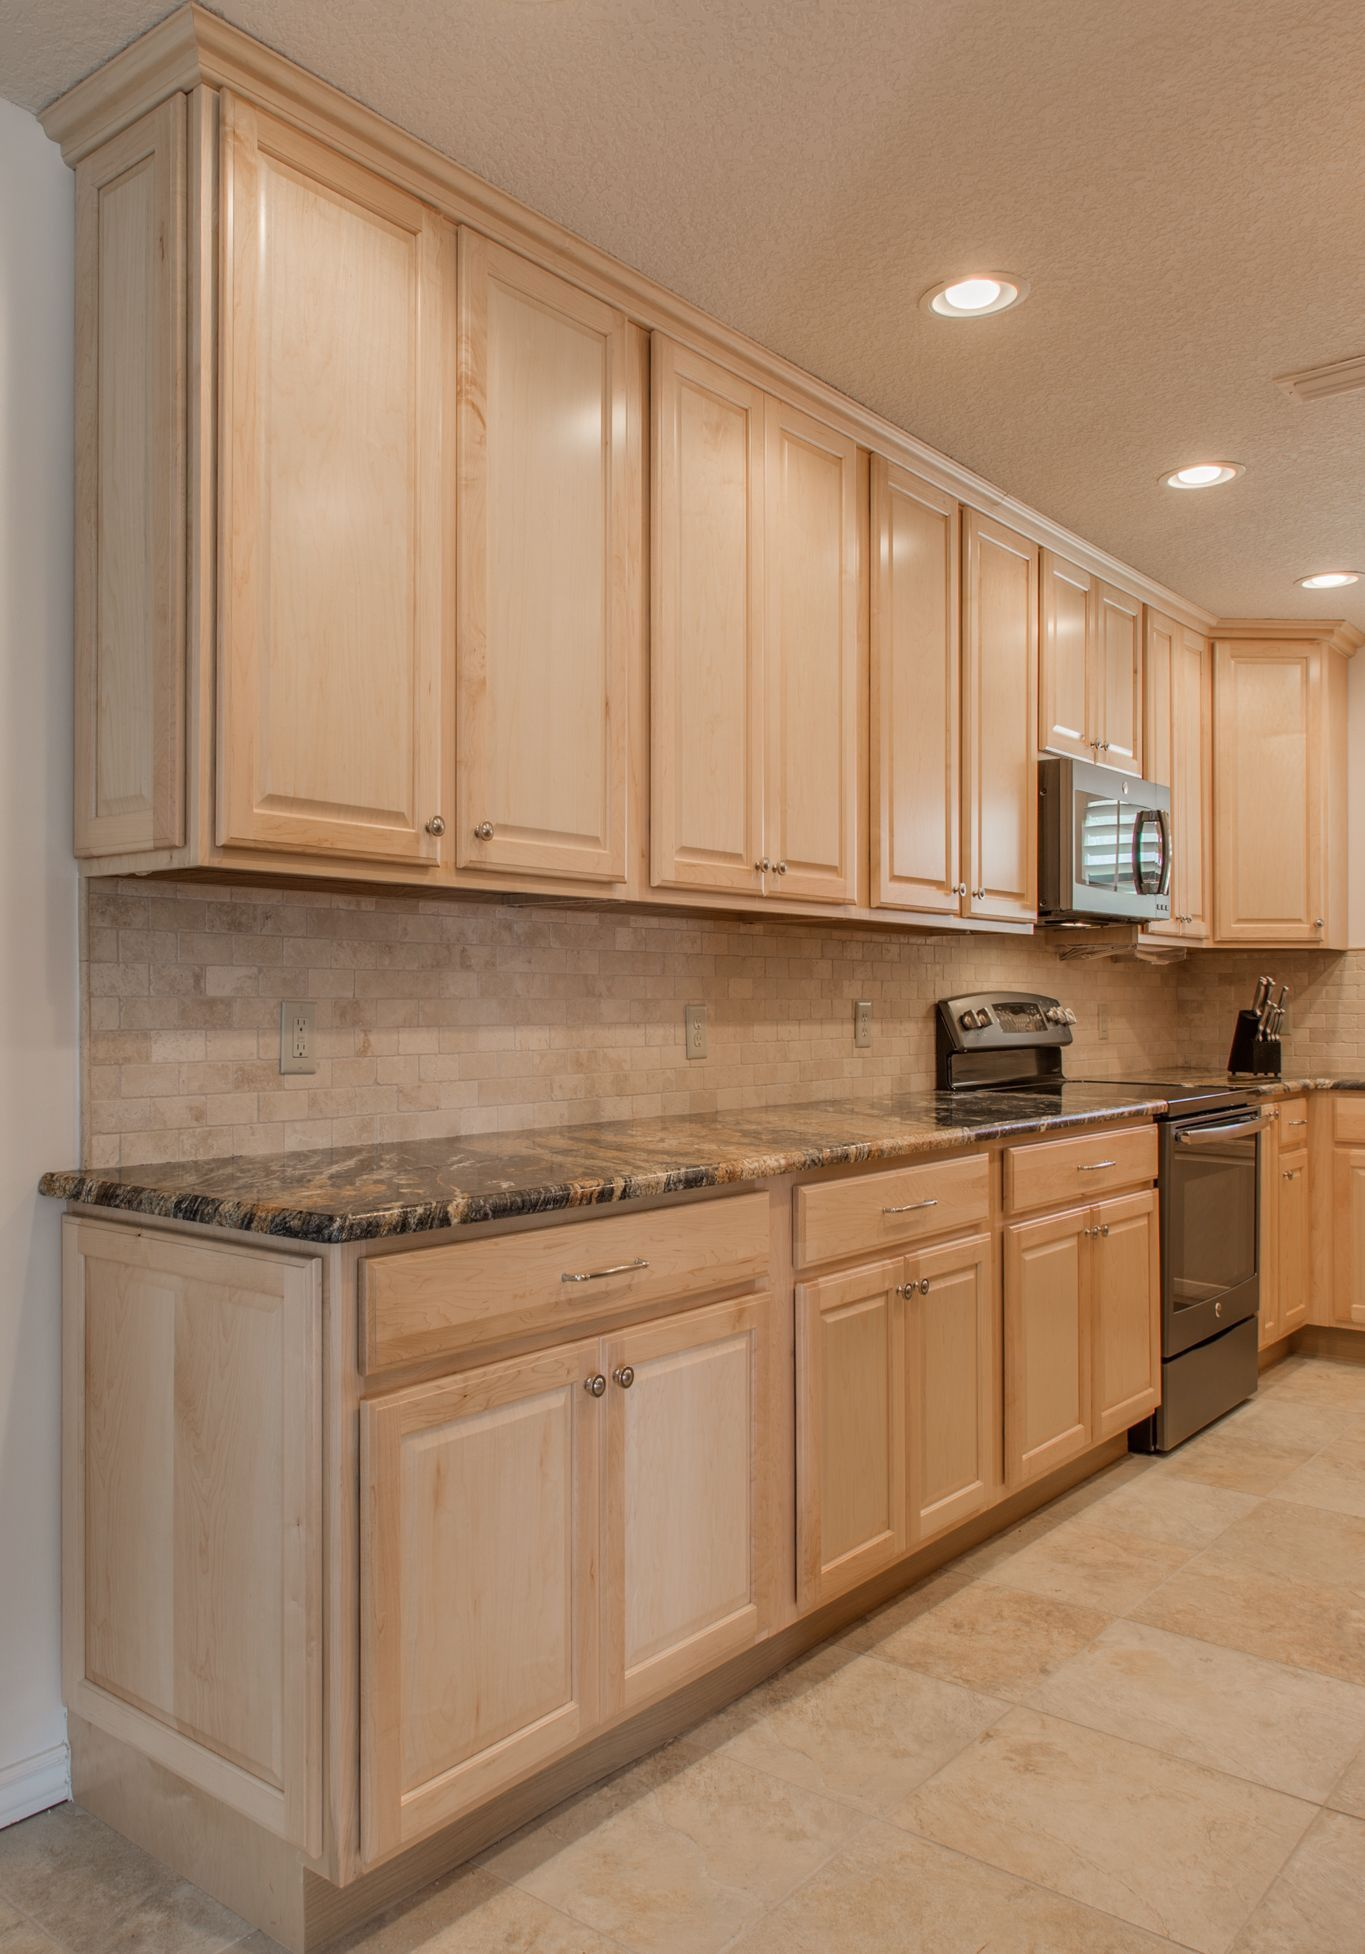 Merillat Glass Cabinet Doors 2021 in 2020 | Maple kitchen ...